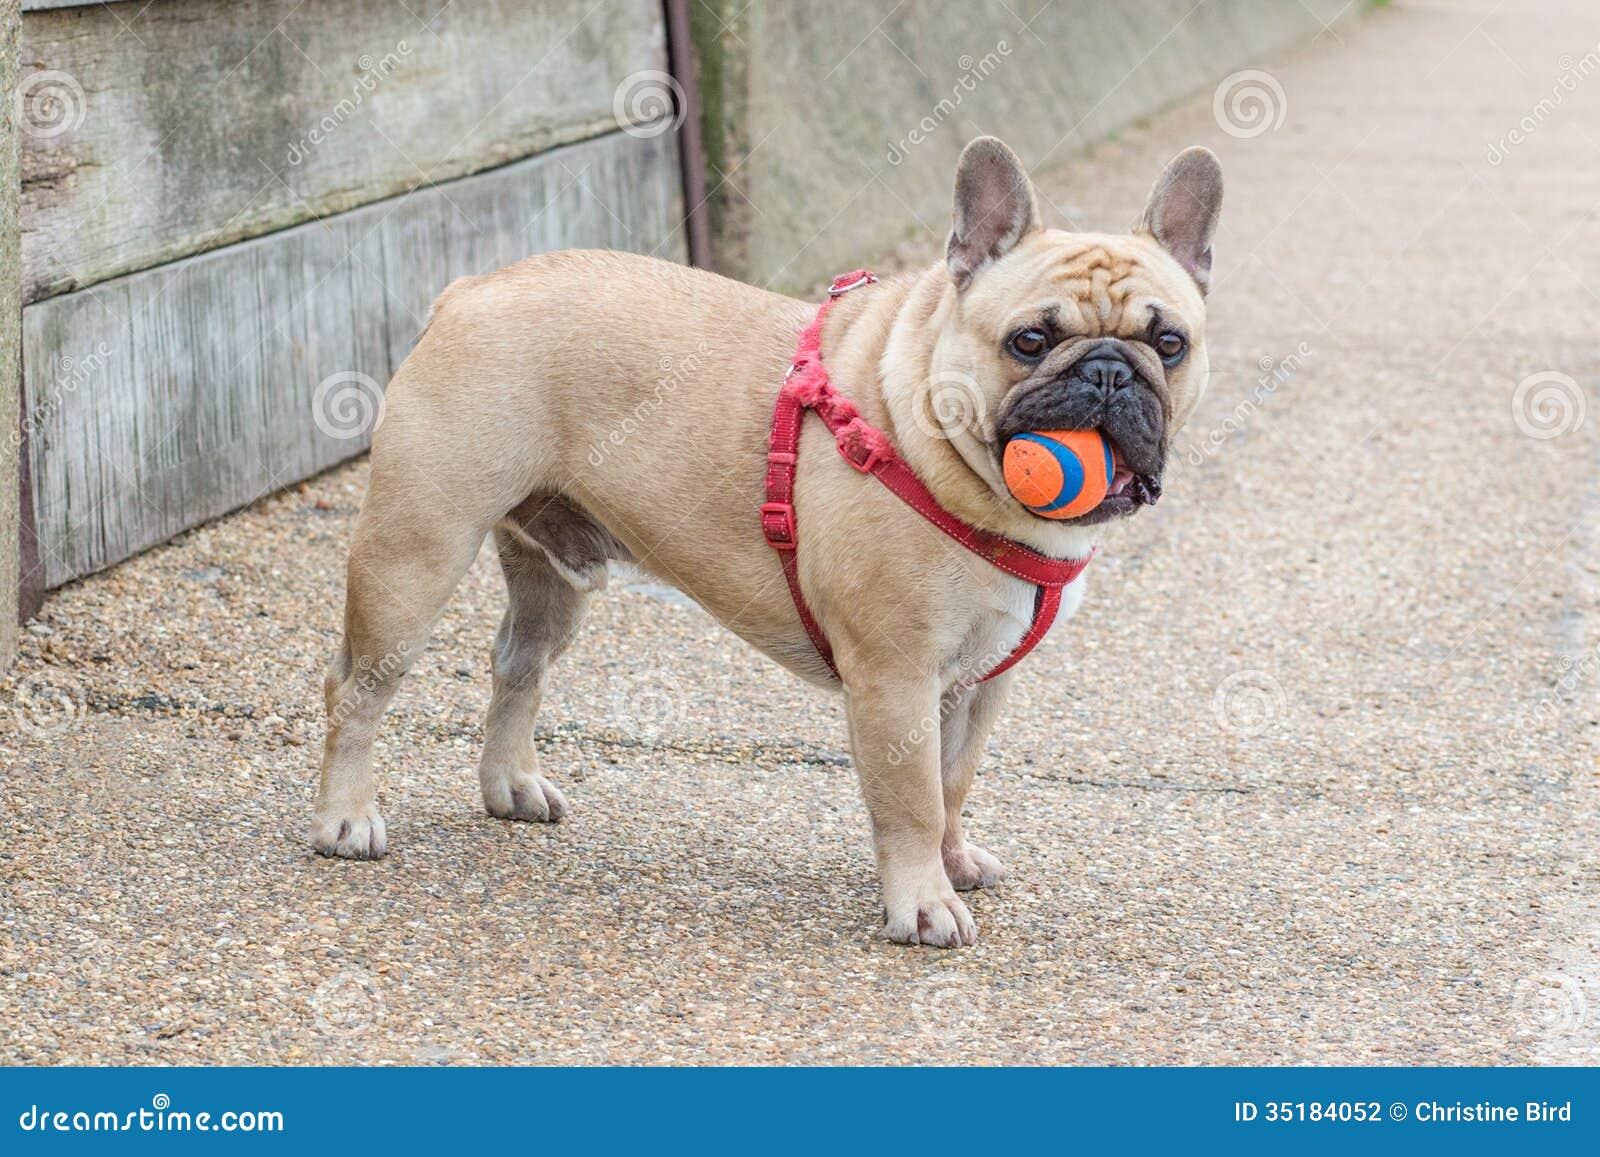 french bull dog stock photo image of standing bulldog   - french bull dog